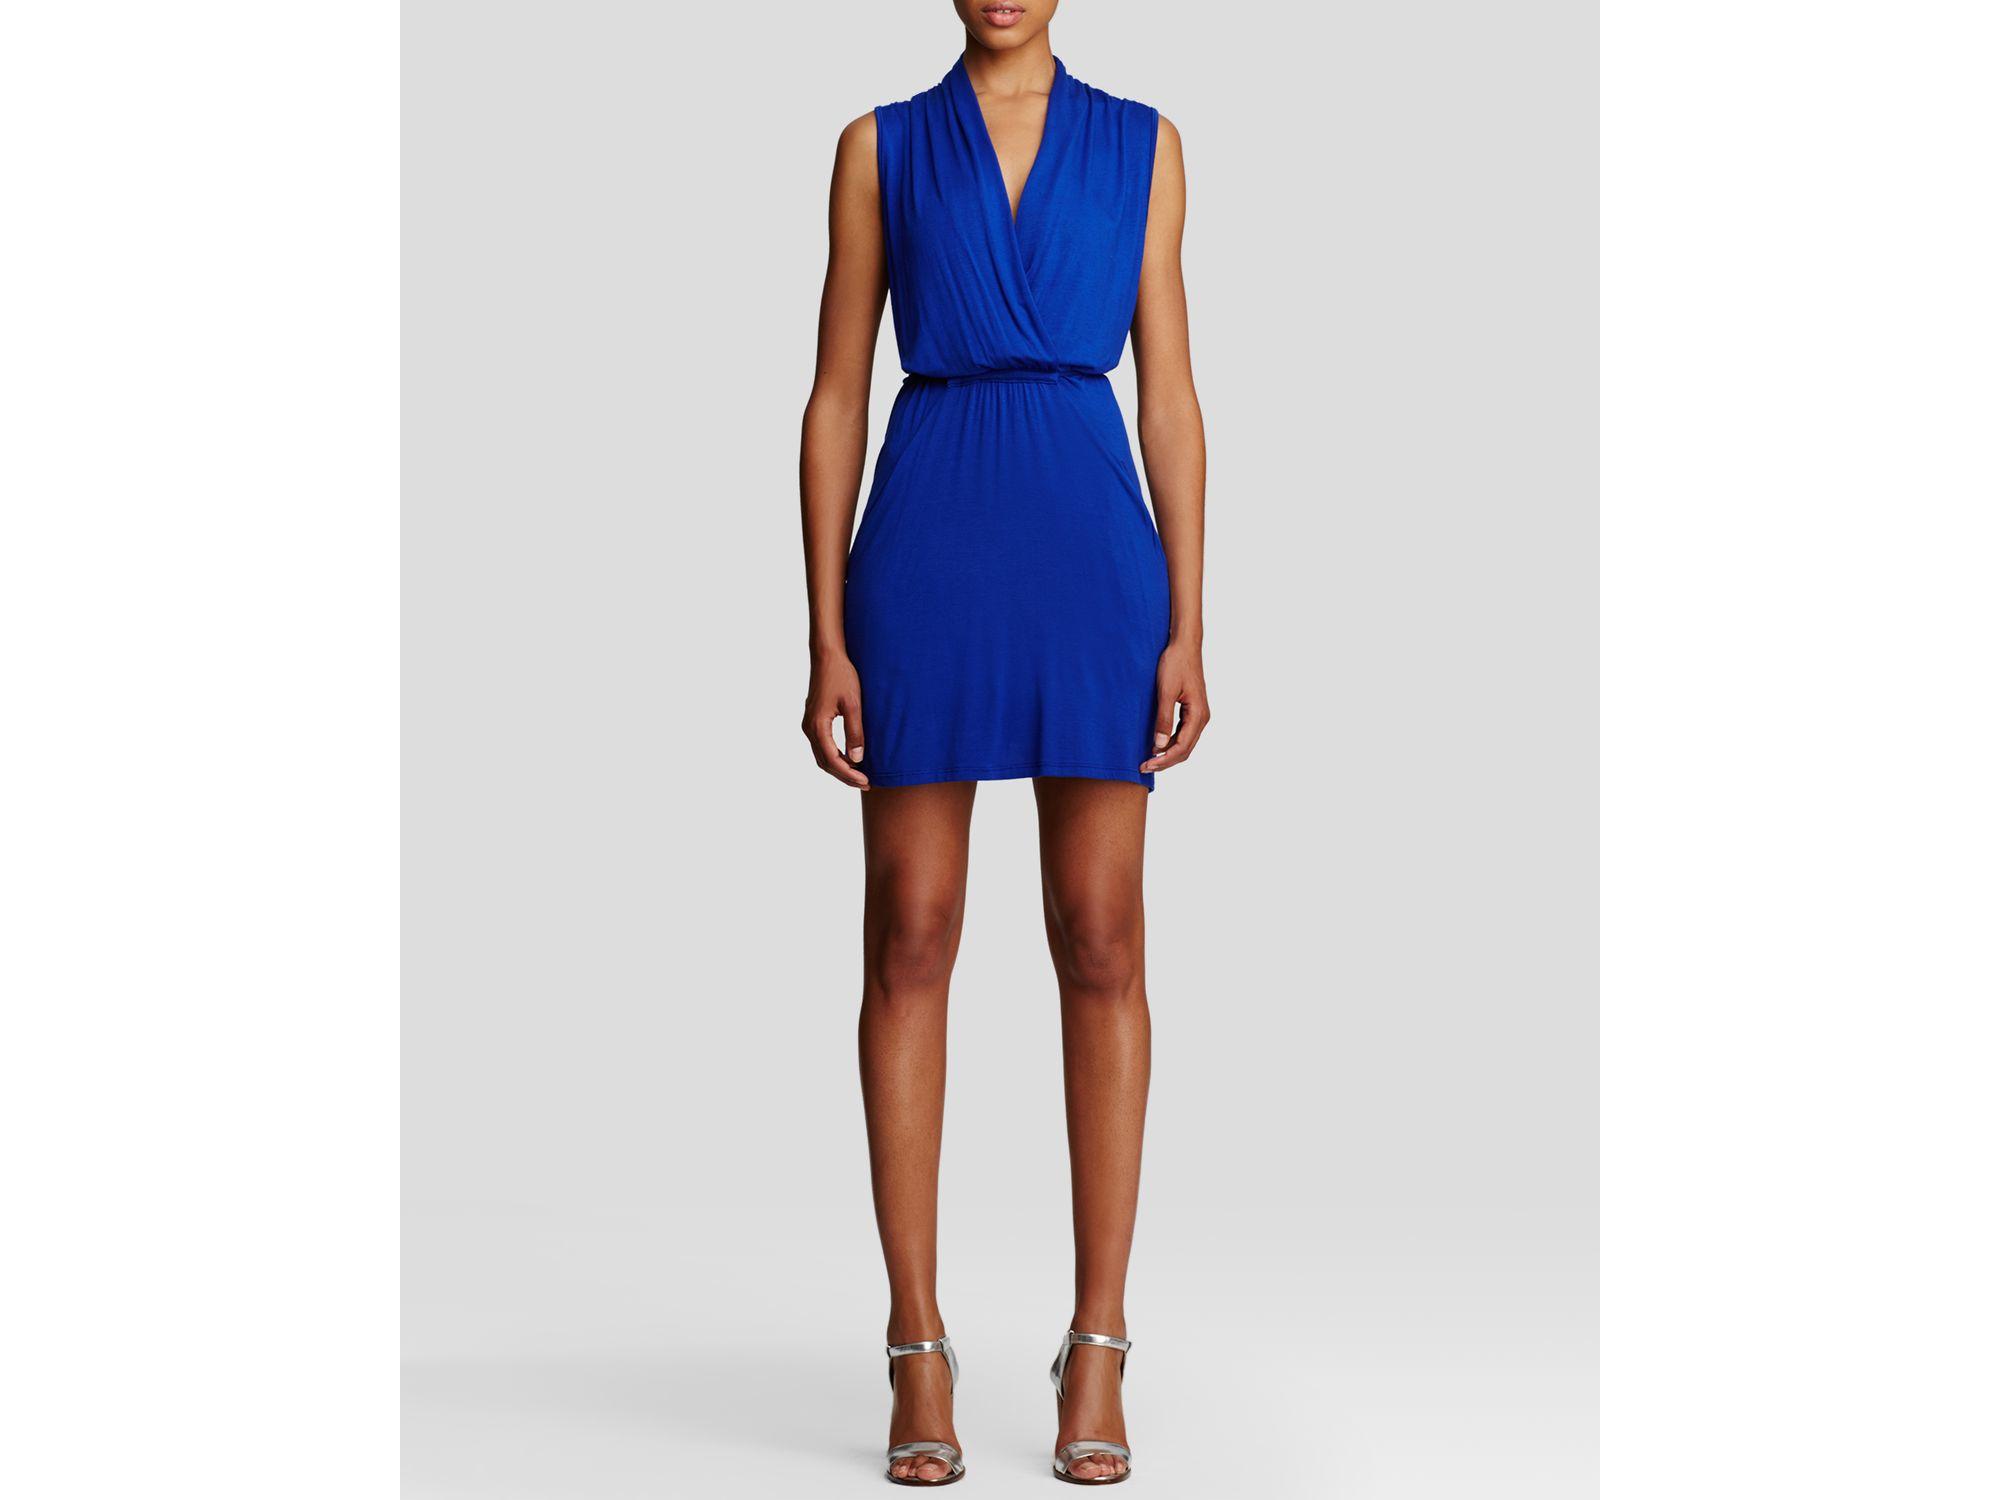 f83db661b5 Lyst - Kut From The Kloth Emily Drape Front Knit Dress in Blue